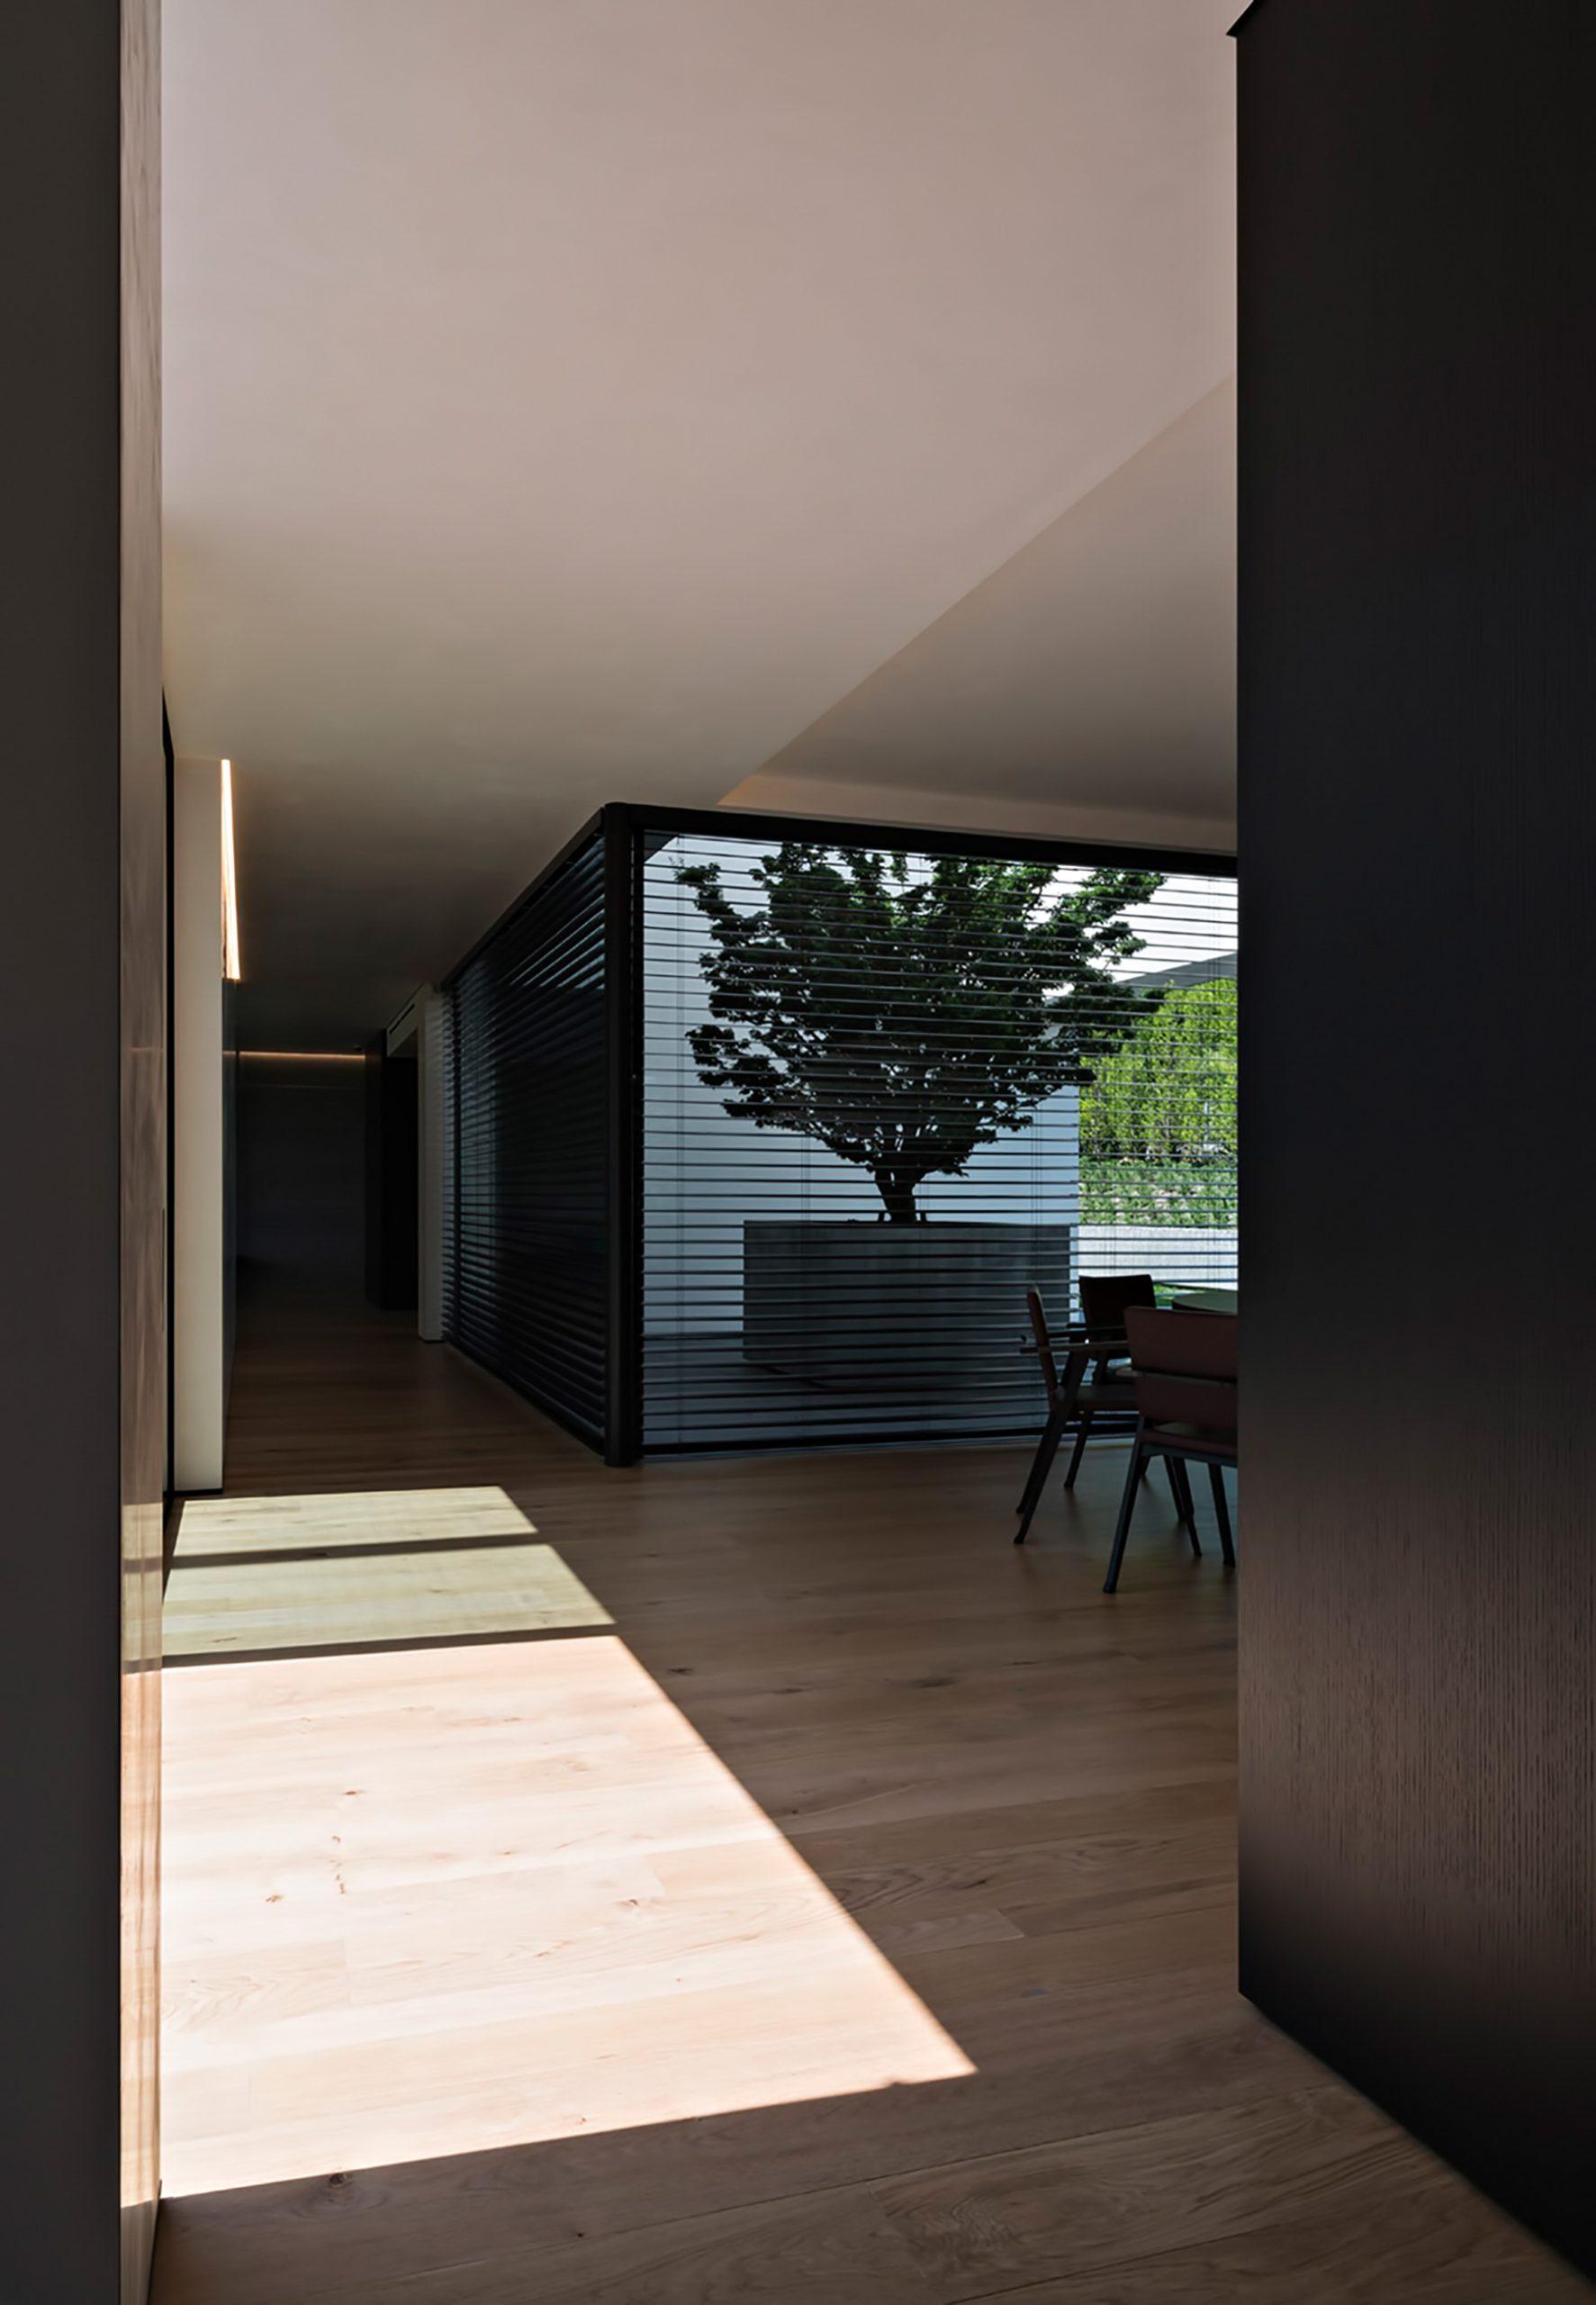 Pietra Luxury Villa - Conegliano, Treviso, Veneto, Italy